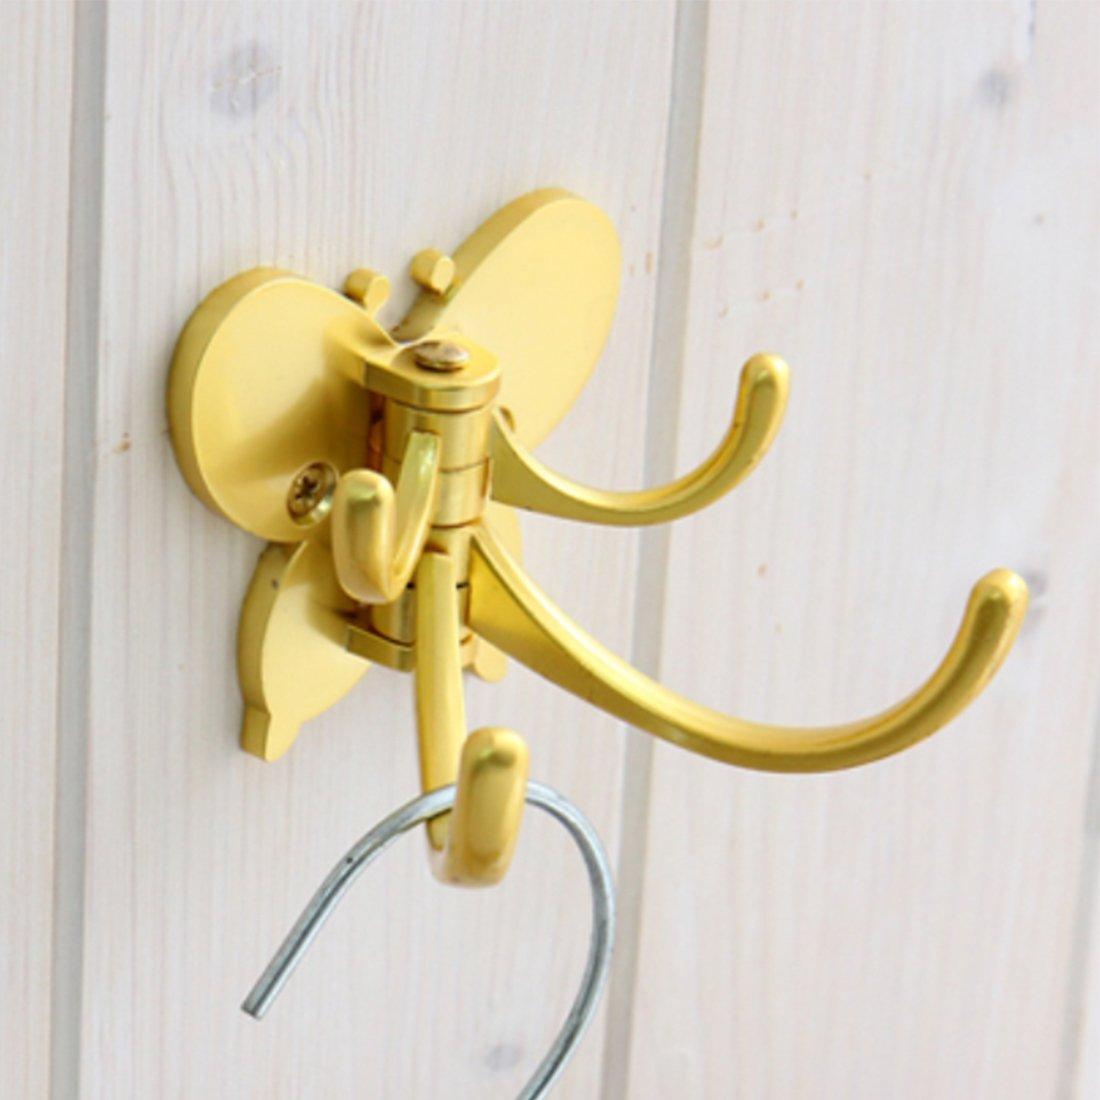 Cheap Folding Wall Hook, find Folding Wall Hook deals on line at ...